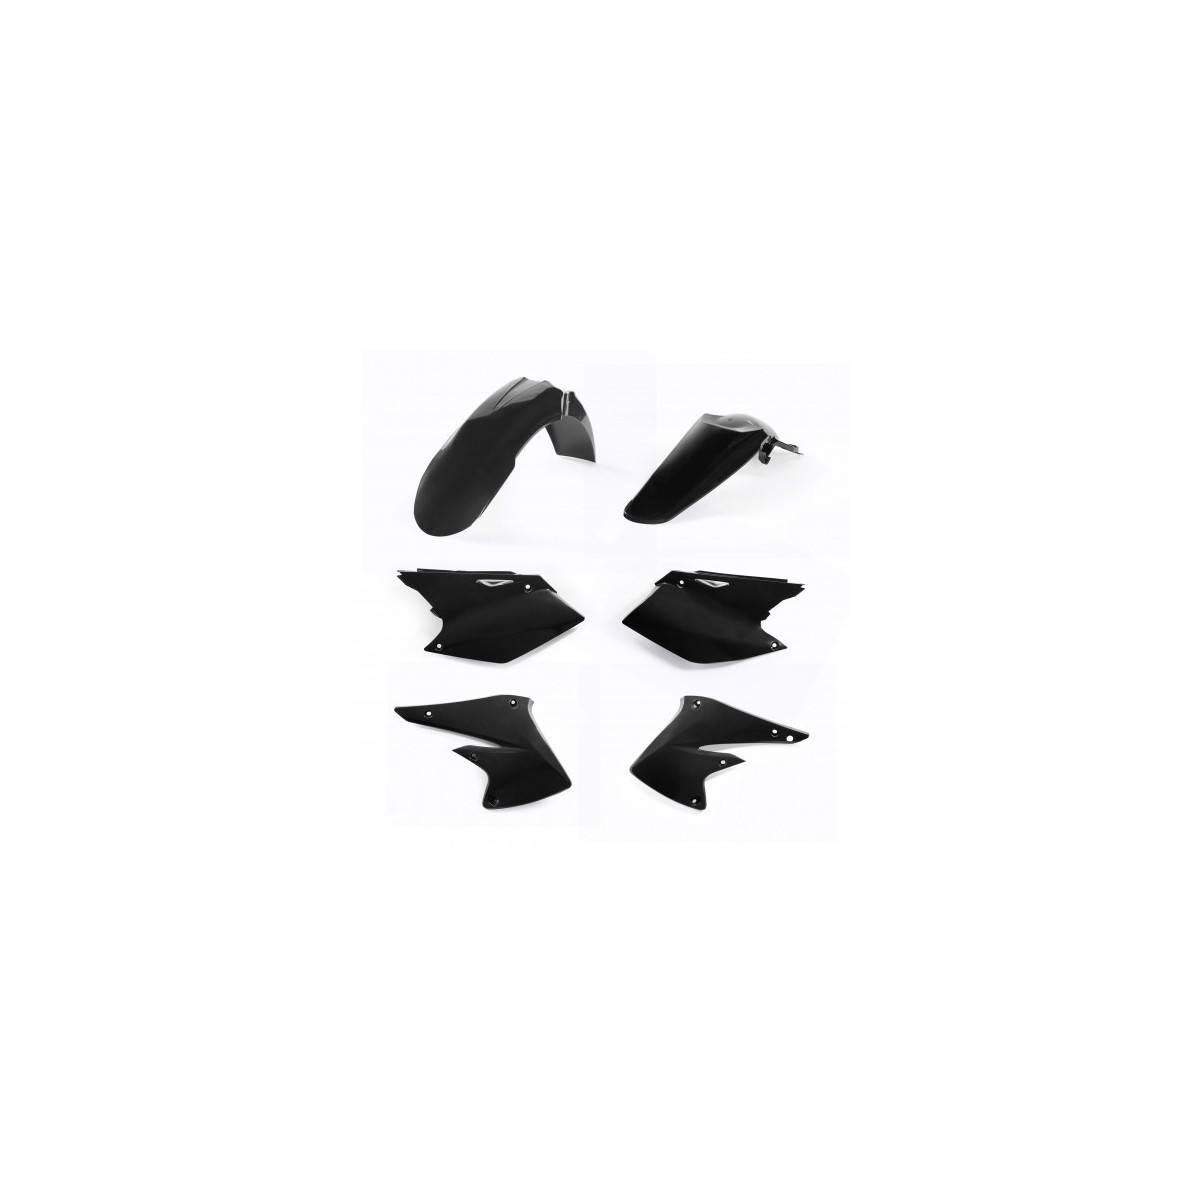 0007519-090 - Kit Plasticos Yzf 250 Yzf 450 03 05 Negro